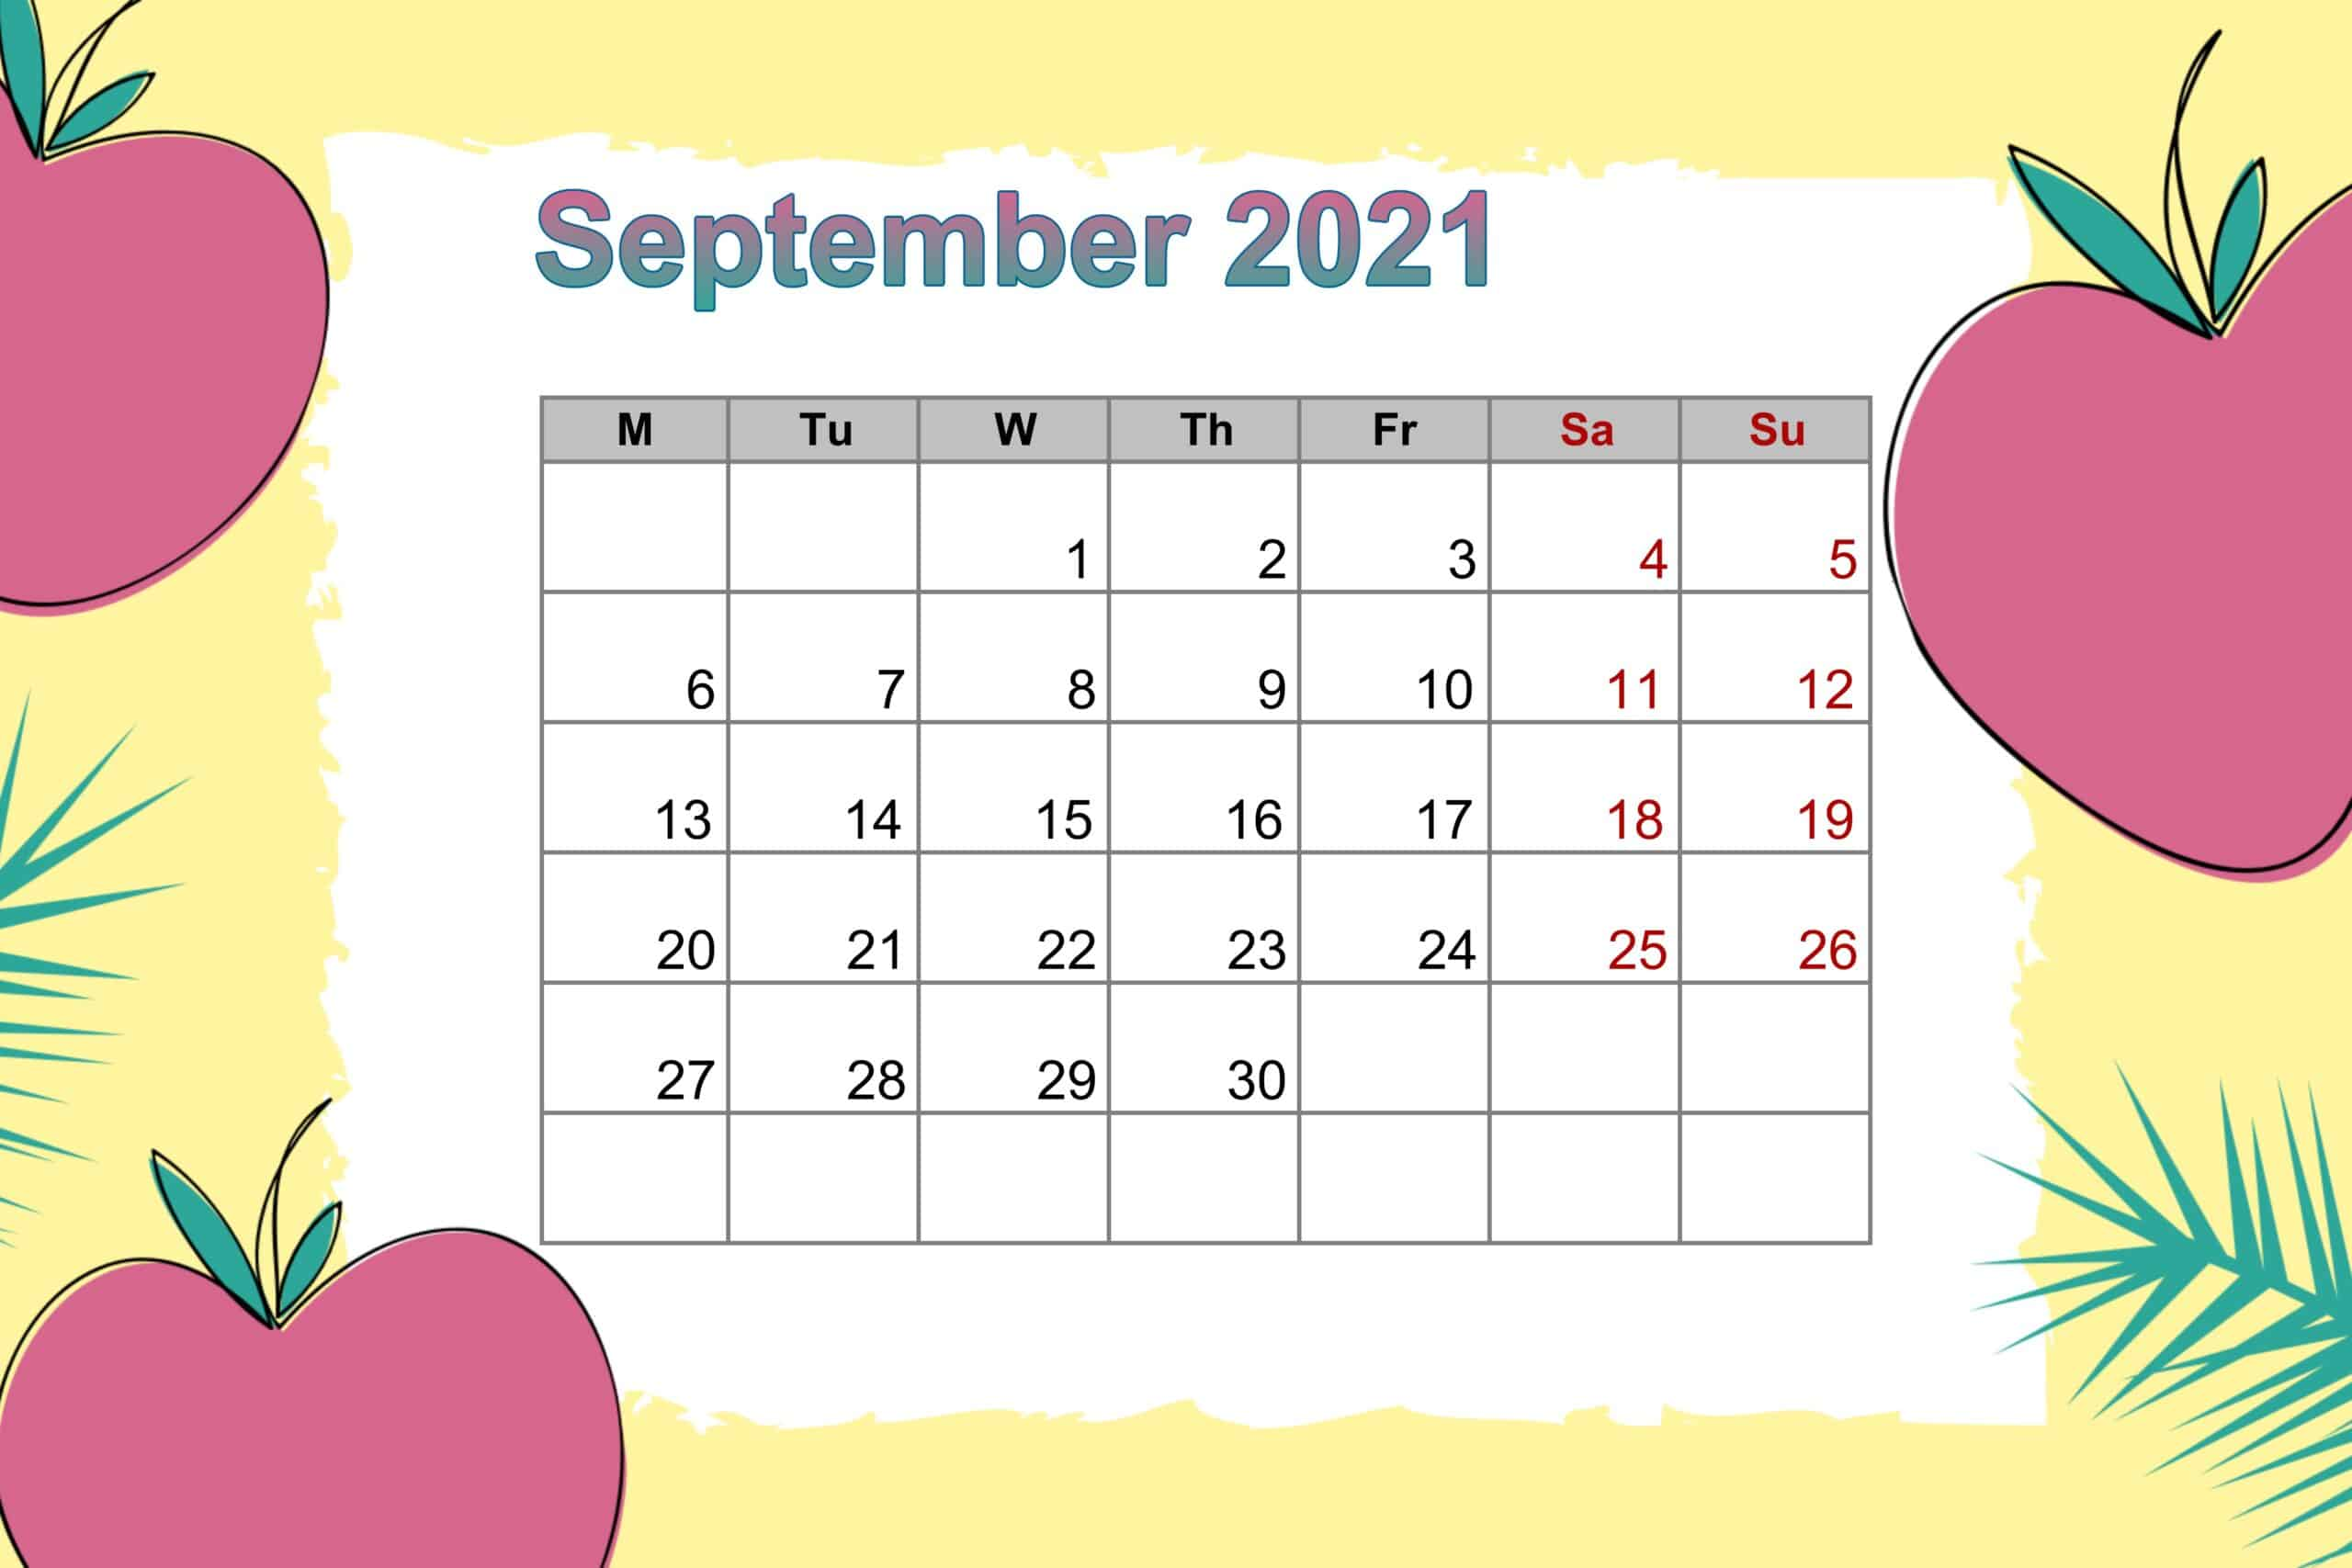 September 2021 Floral Calendar